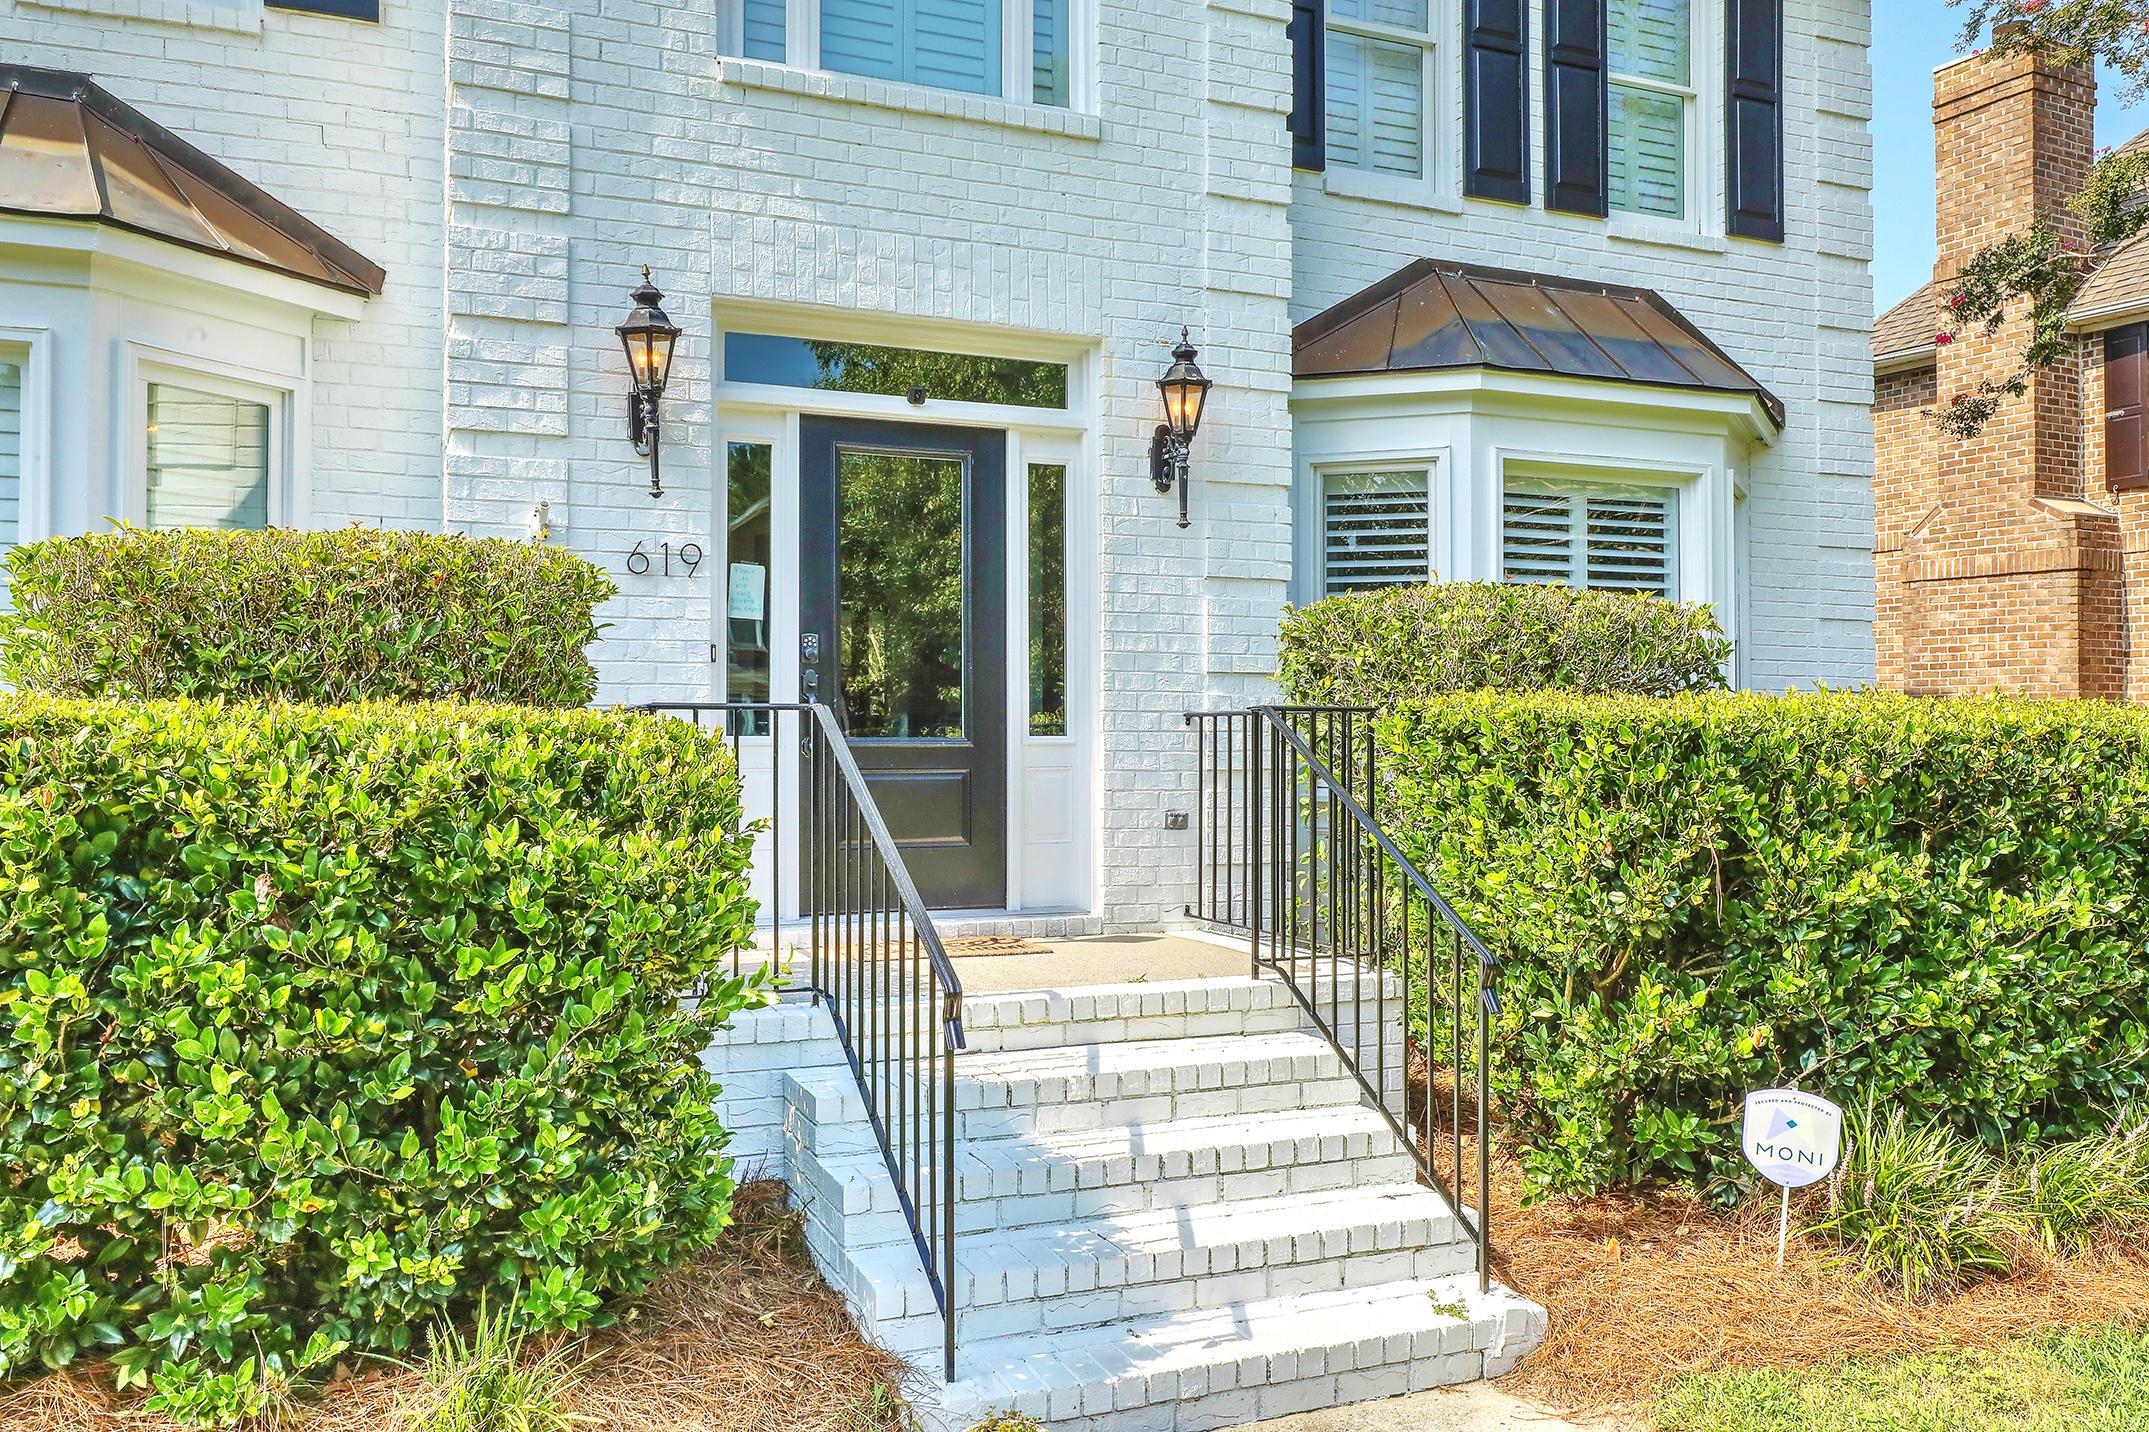 Hobcaw Creek Plantation Homes For Sale - 619 Palisades, Mount Pleasant, SC - 39